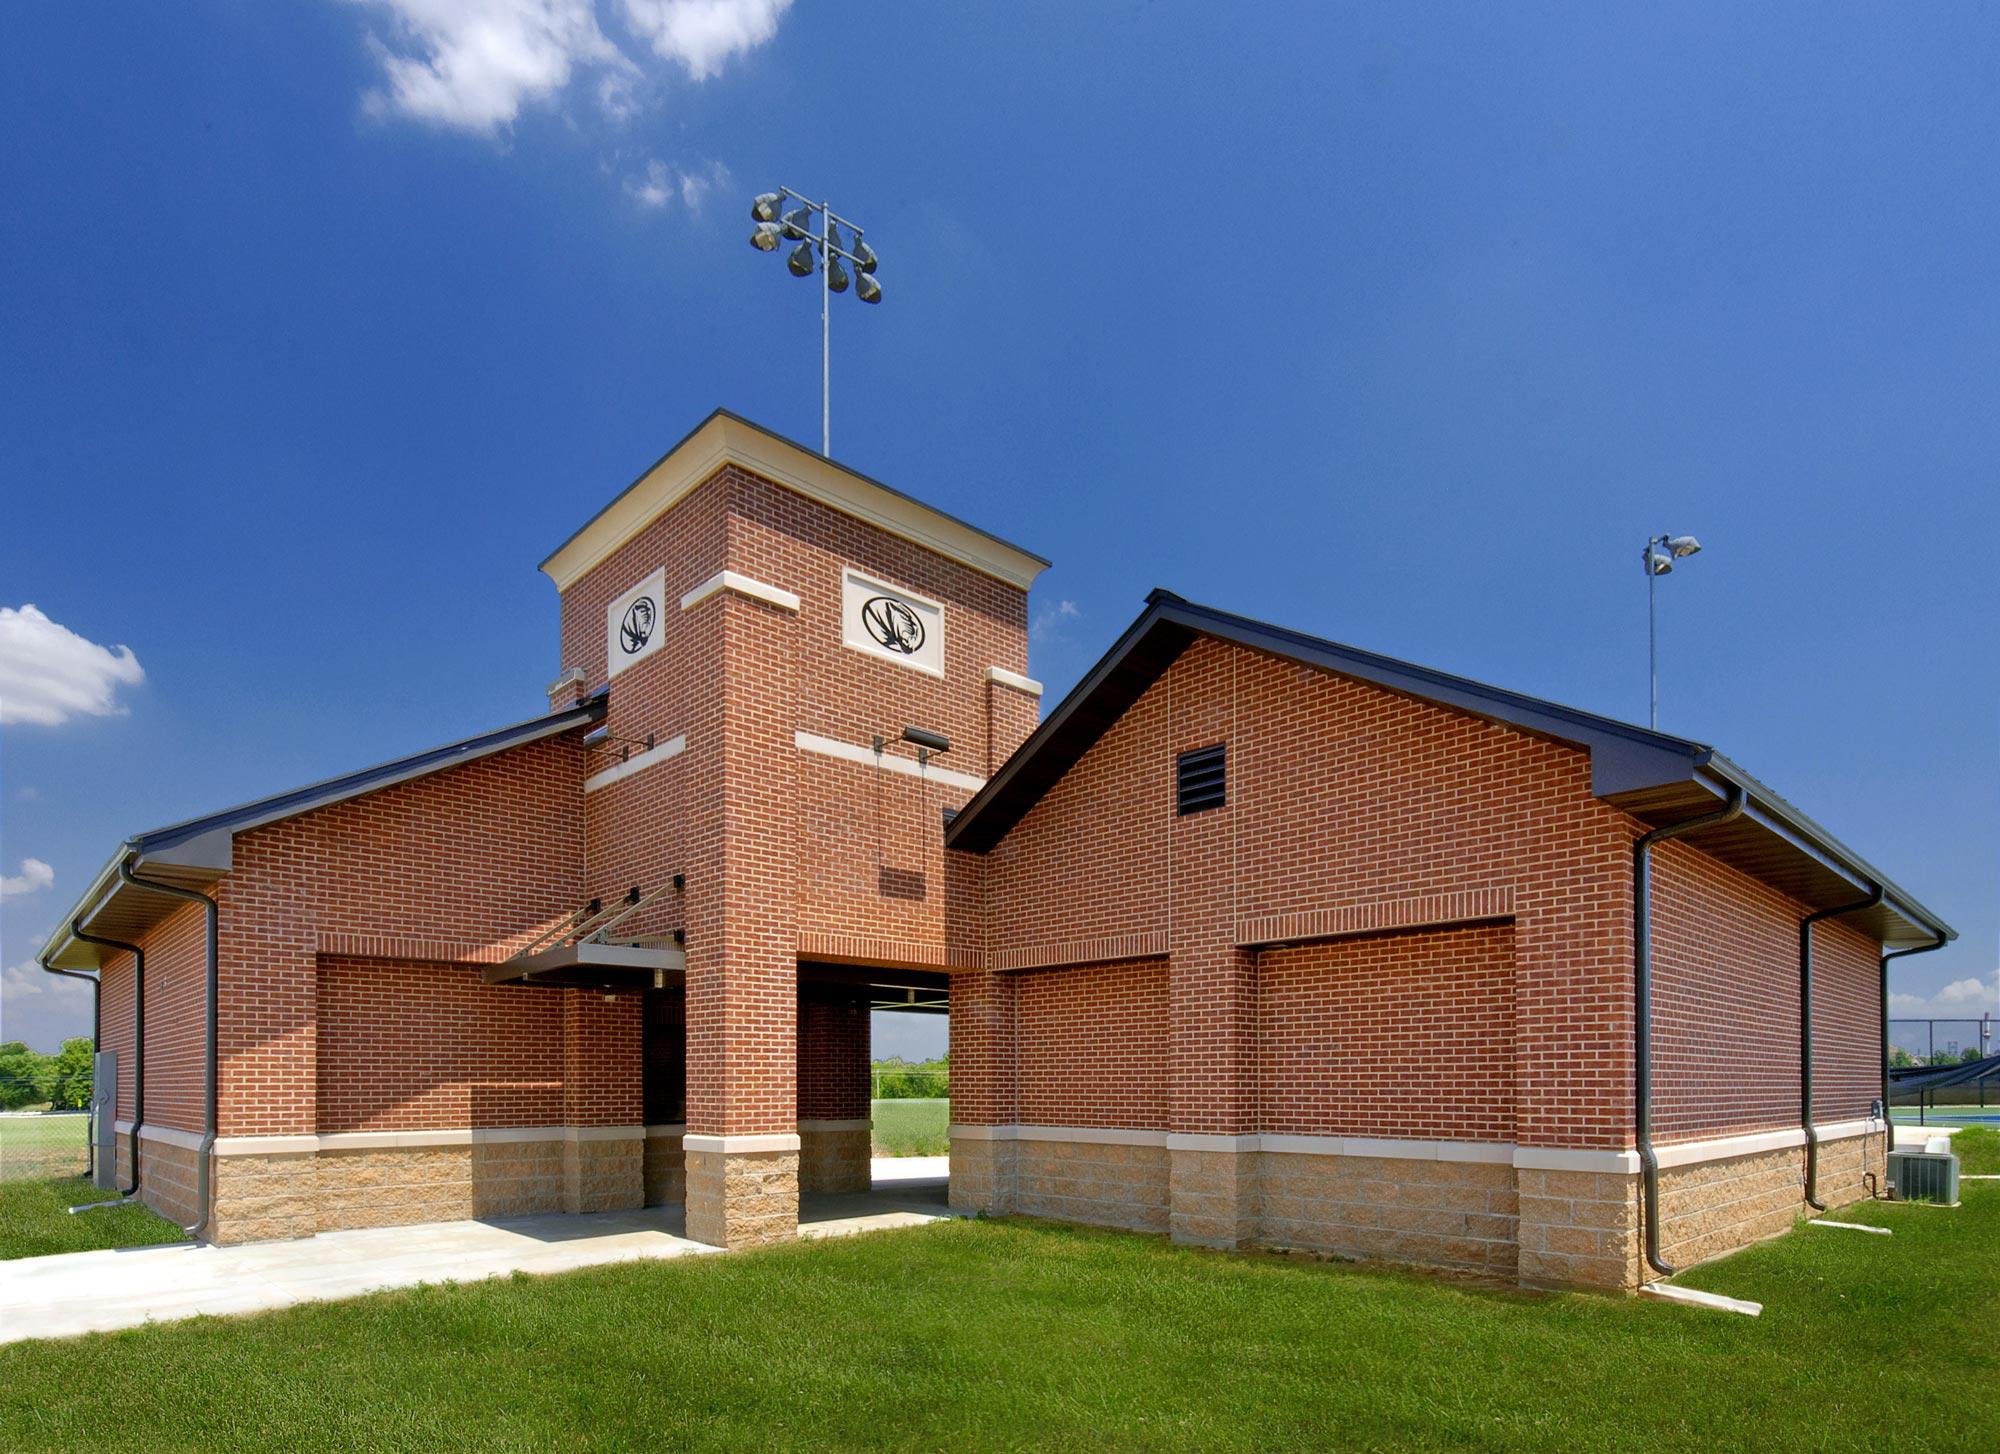 Republic-High-School-Soccer-Tennis-Complex-H-Design-Exterior-01.jpg